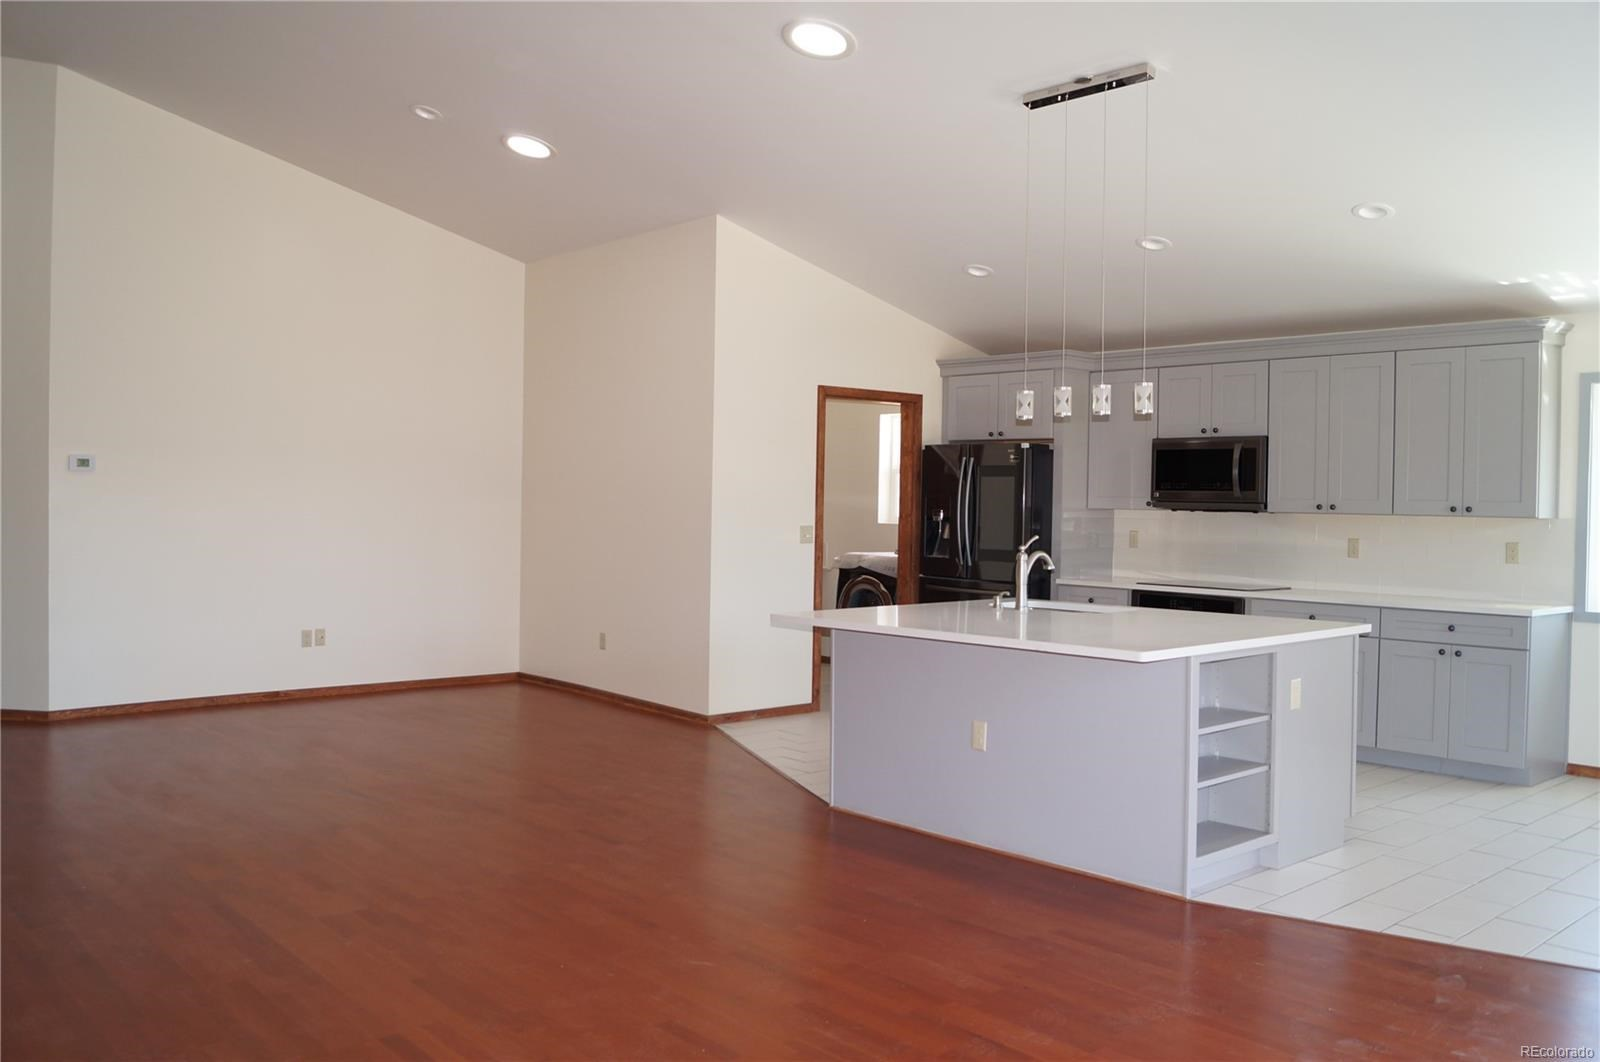 MLS# 9875706 - 1 - 402  Lyell Street, Monte Vista, CO 81144